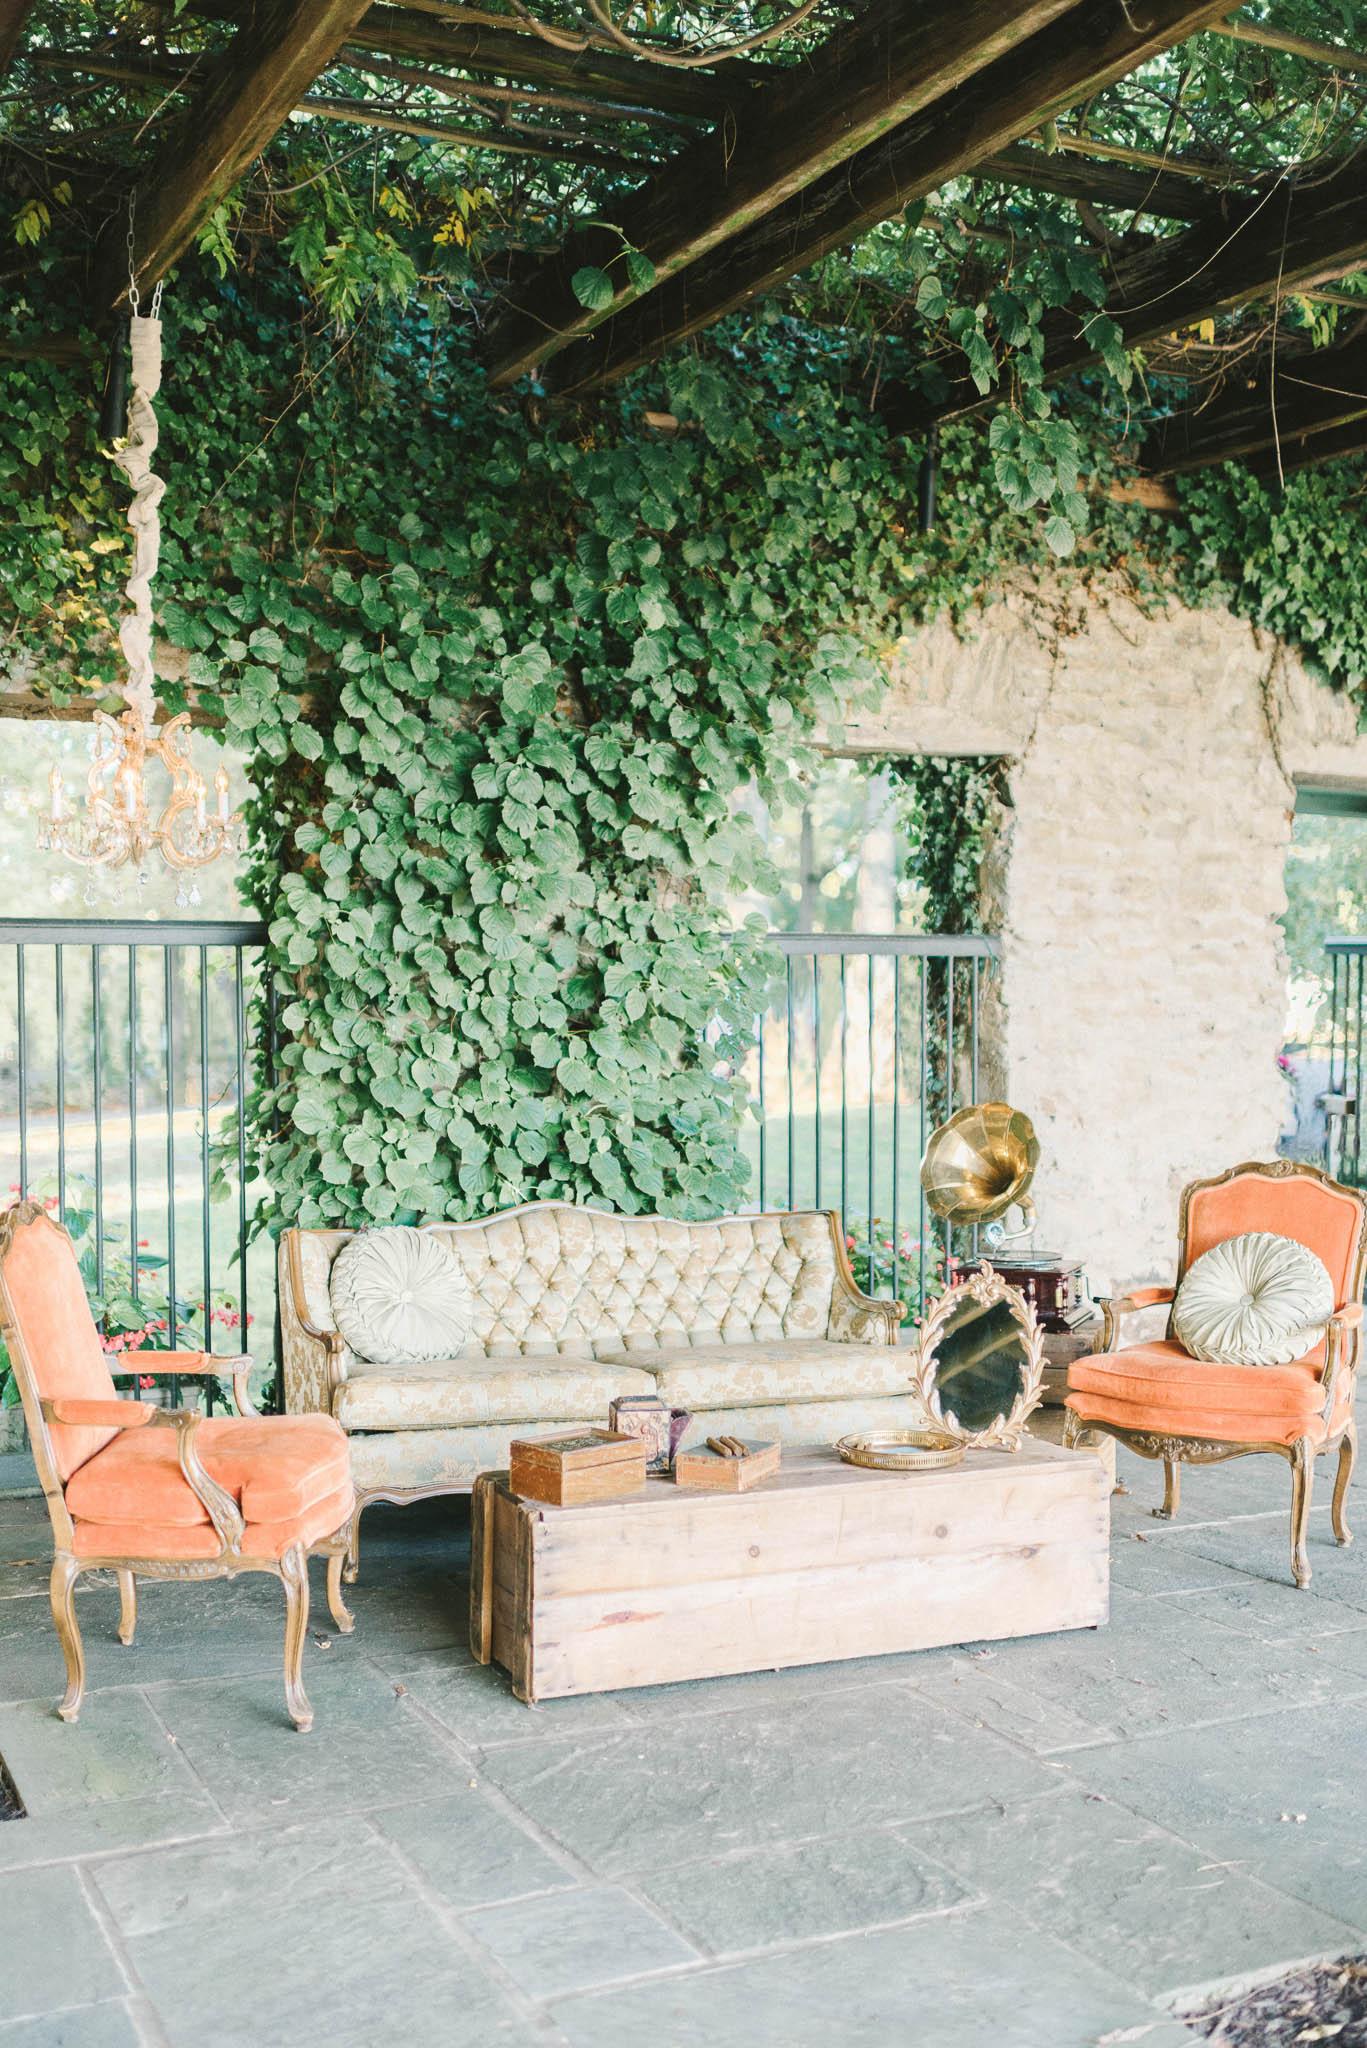 wedding lounge orange and tan seating and greenery wall